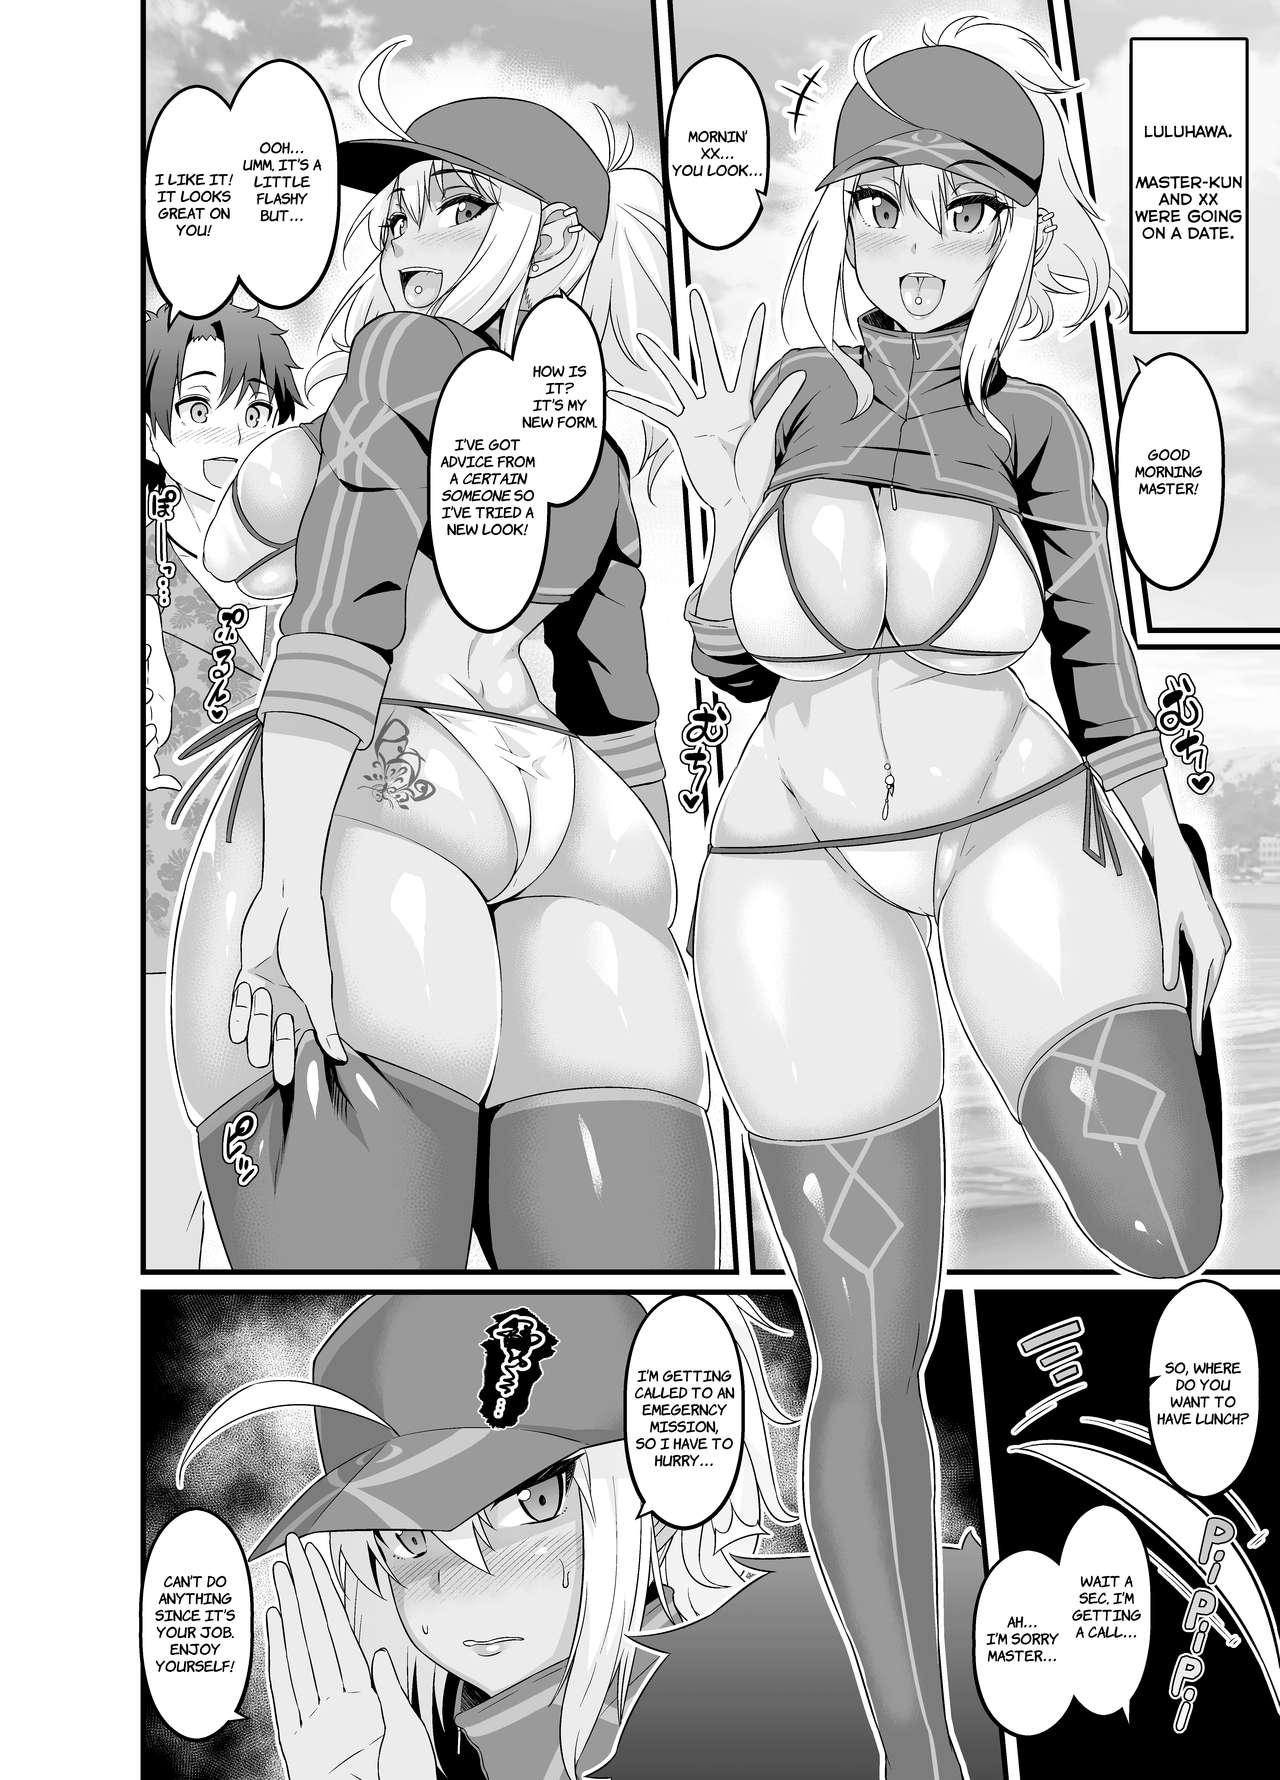 [Ankoman] Nazo no Heroine XX, Master no Shiranai Aida ni Bitch-ka suru no Maki - That time Mysterious Heroine XX became a Bitch while Master wasn't Looking (Fate/Grand Order) [English] [MFerbt TL] 0